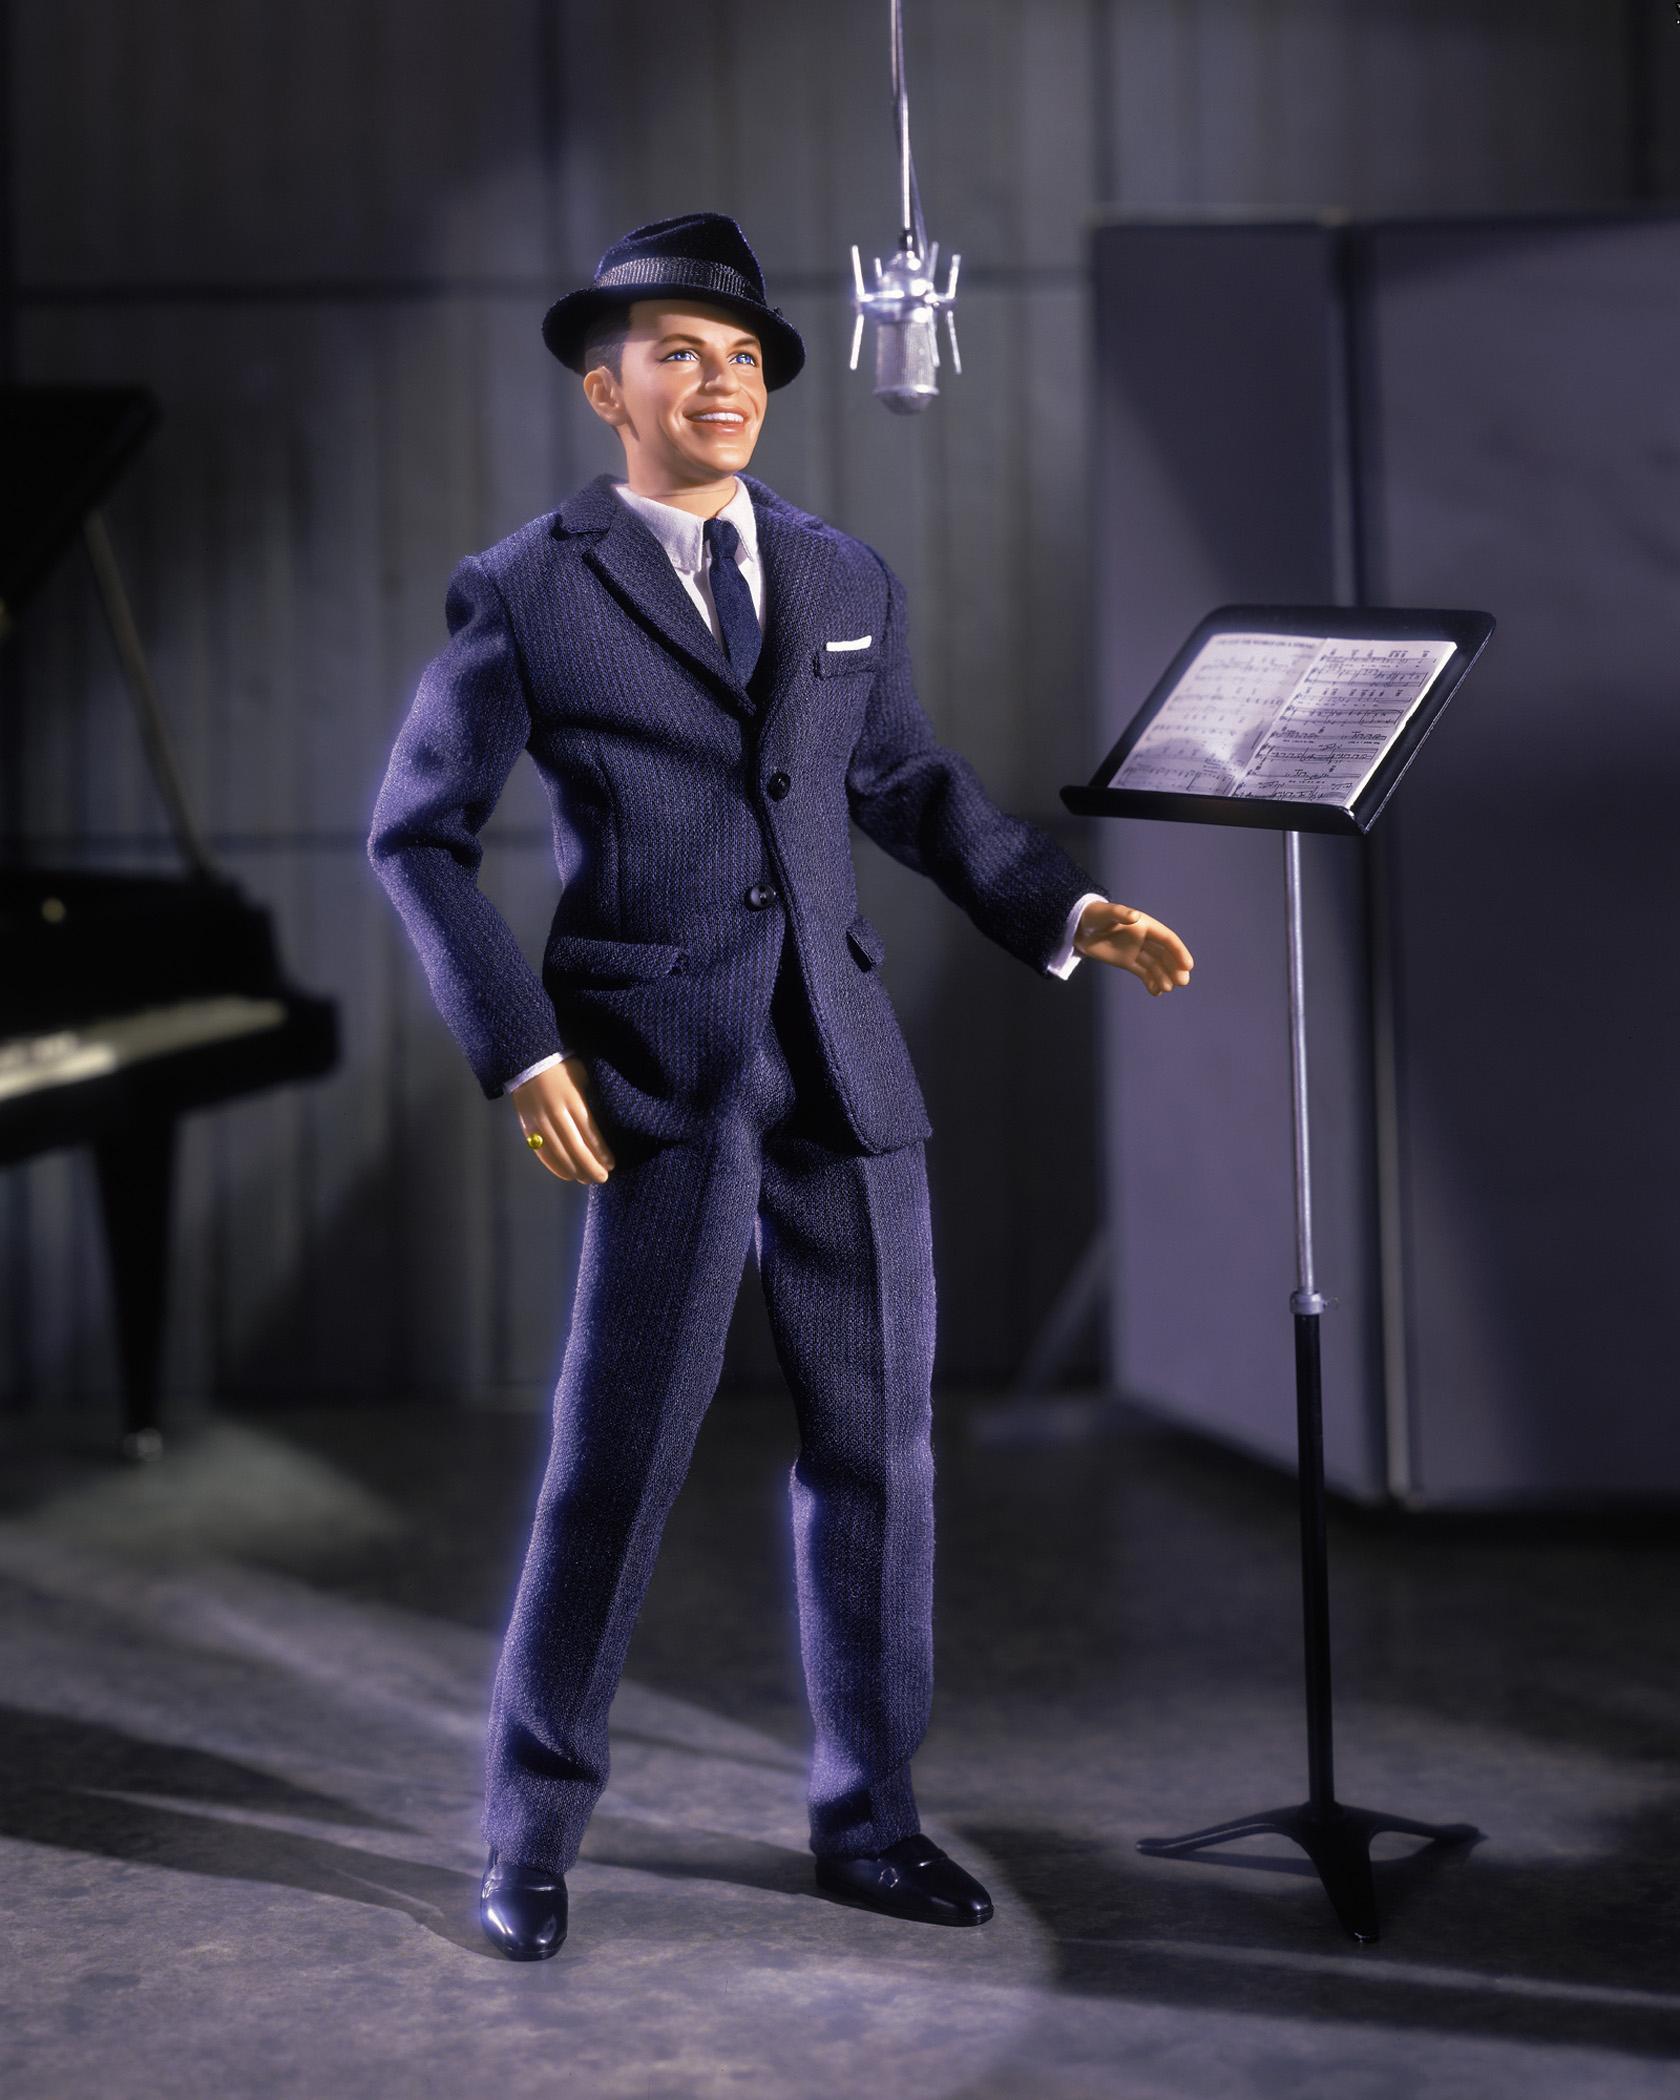 The Frank Sinatra Barbie, released in 2000.